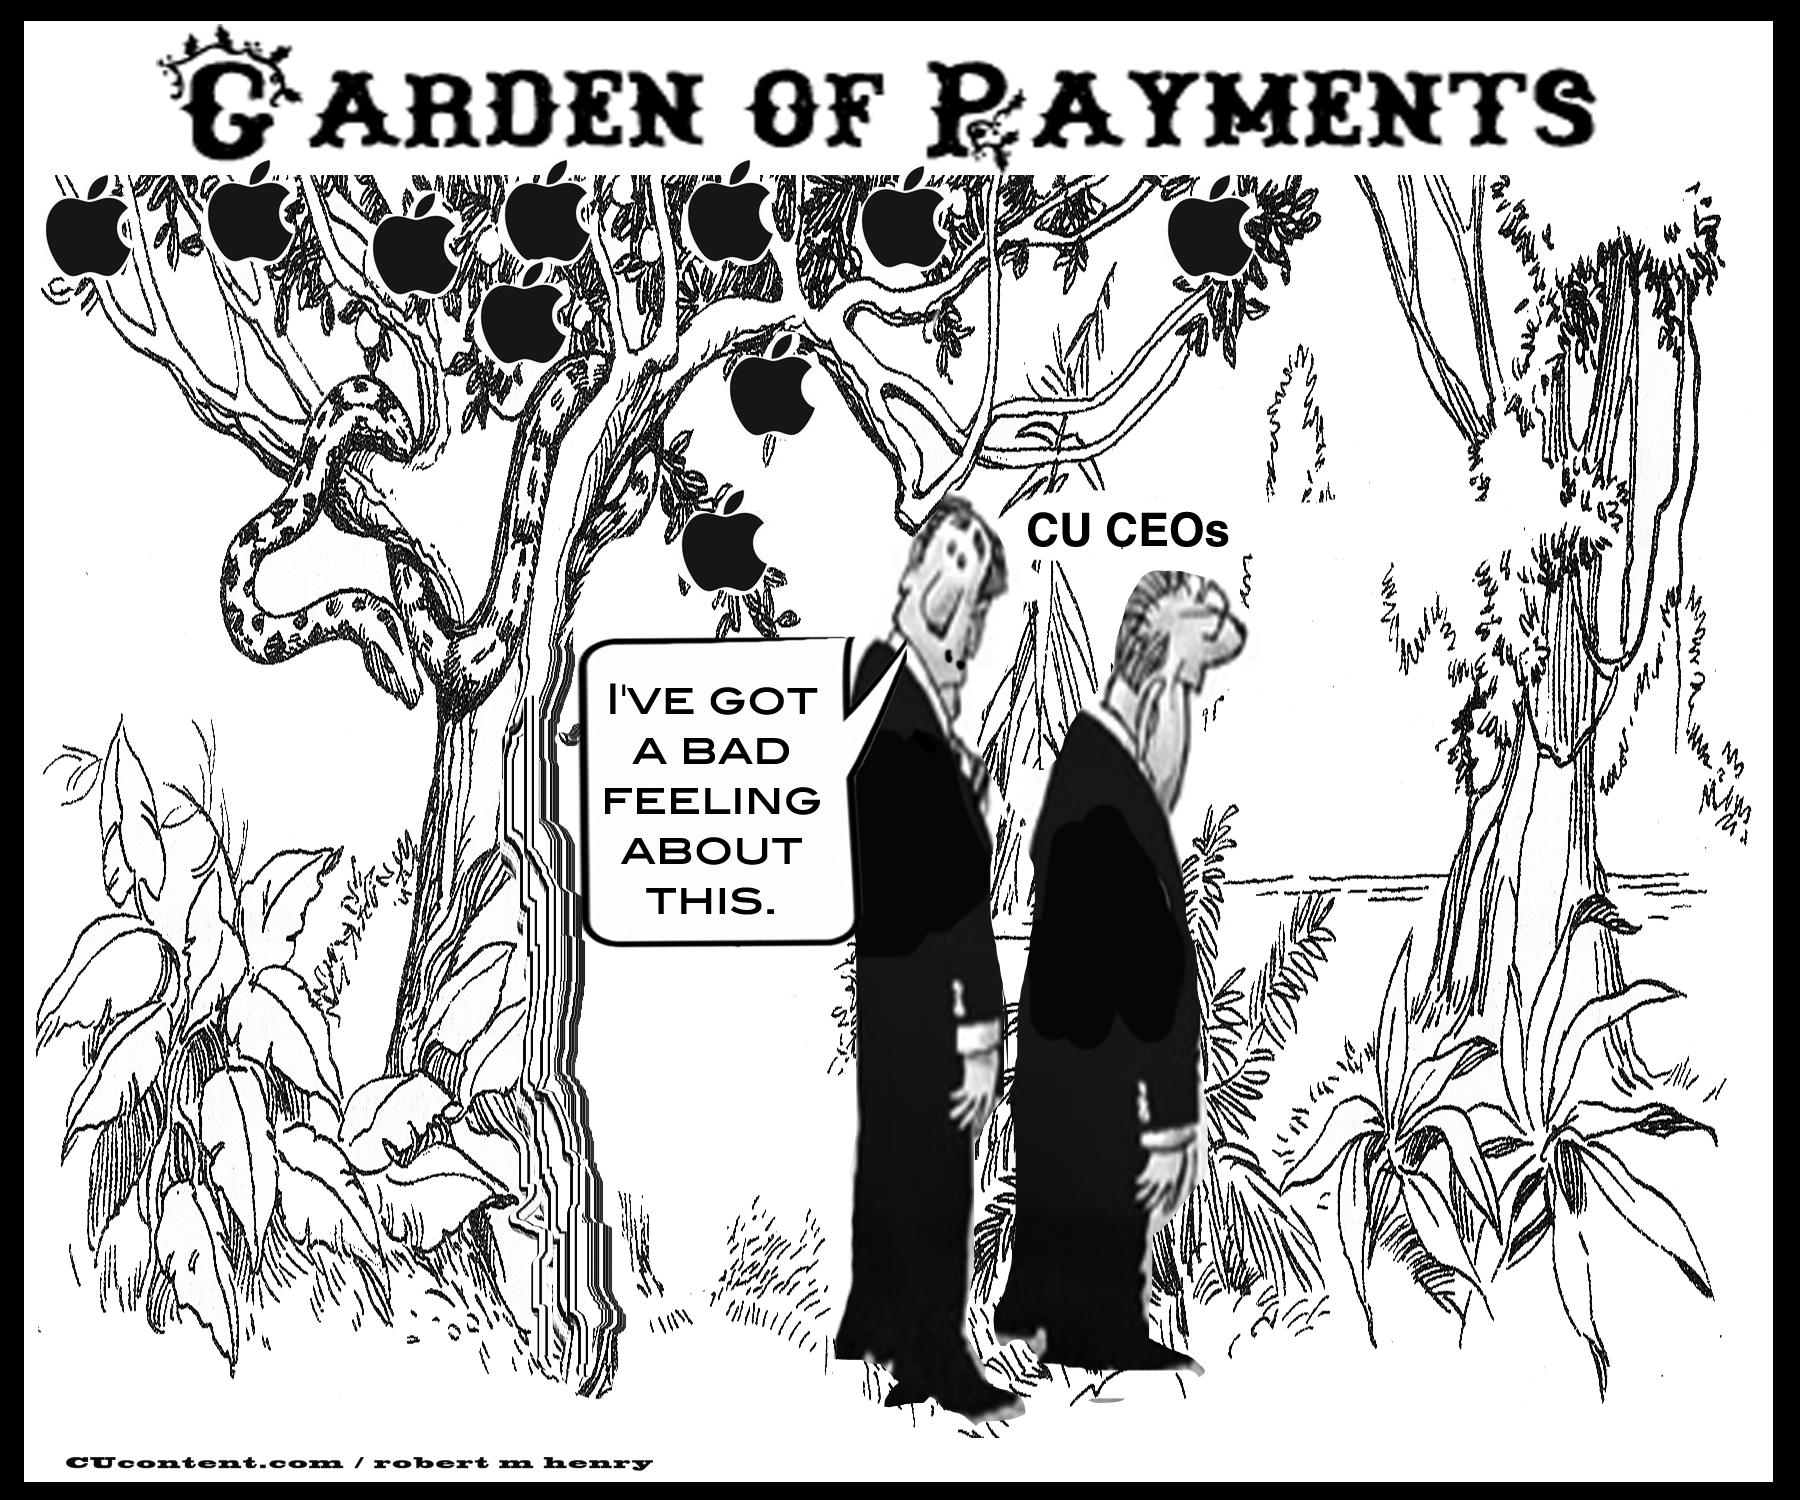 Garden of Payments